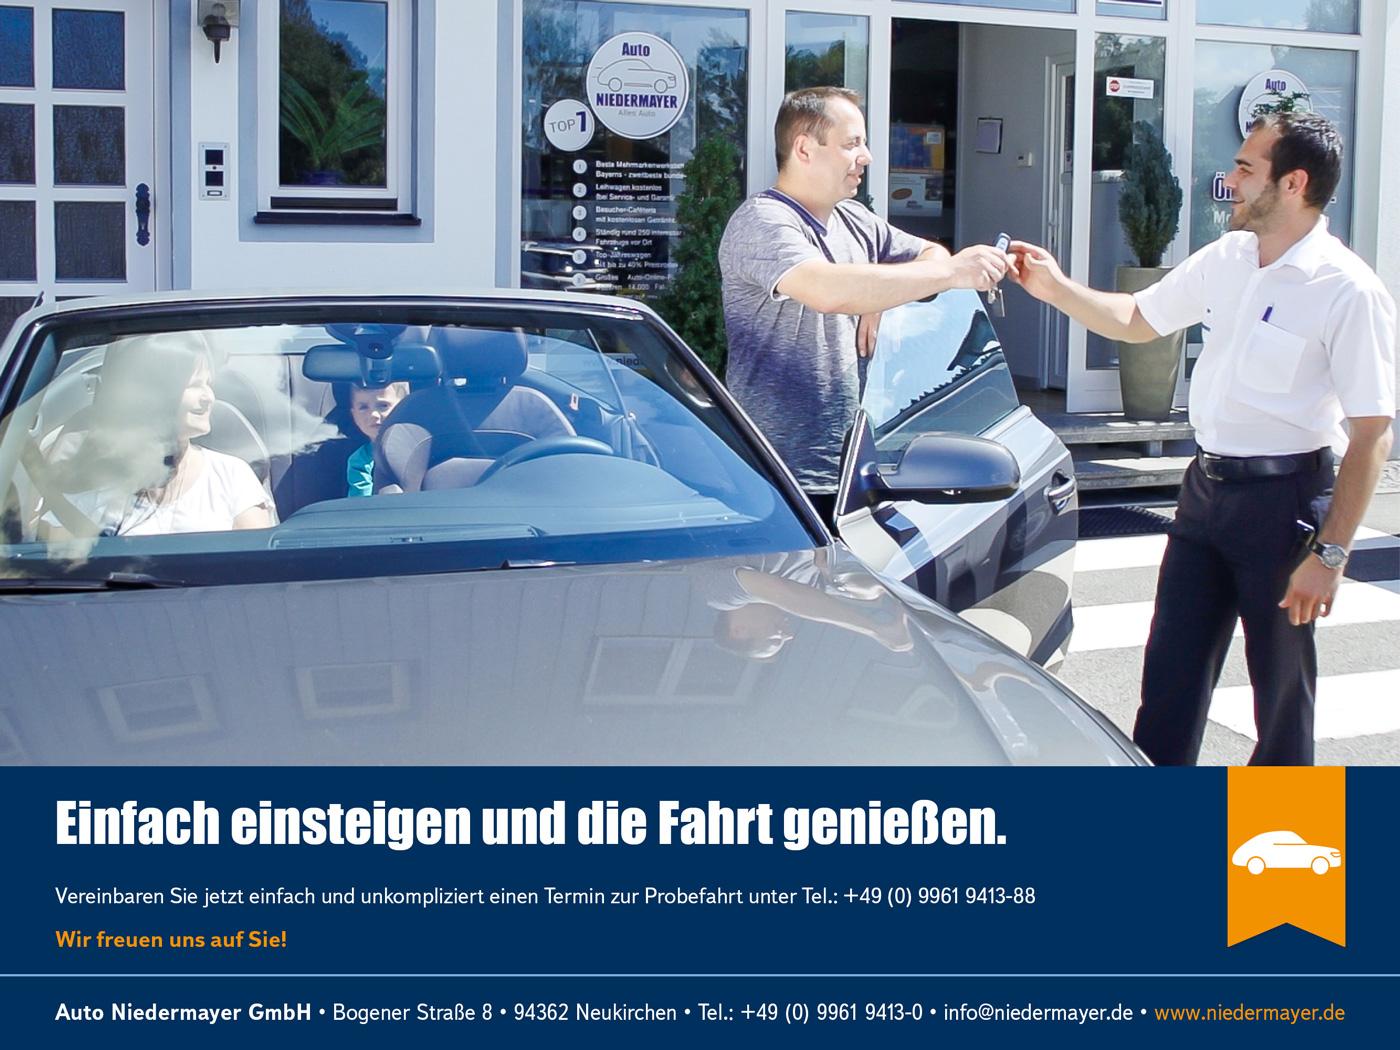 SKODA KAROQ 1.0 TSI Ambition, Sitzheizung, Sunset, Kessy, Bluetooth, sofort Auto Niedermayer B2B, D-94362 Neukirchen